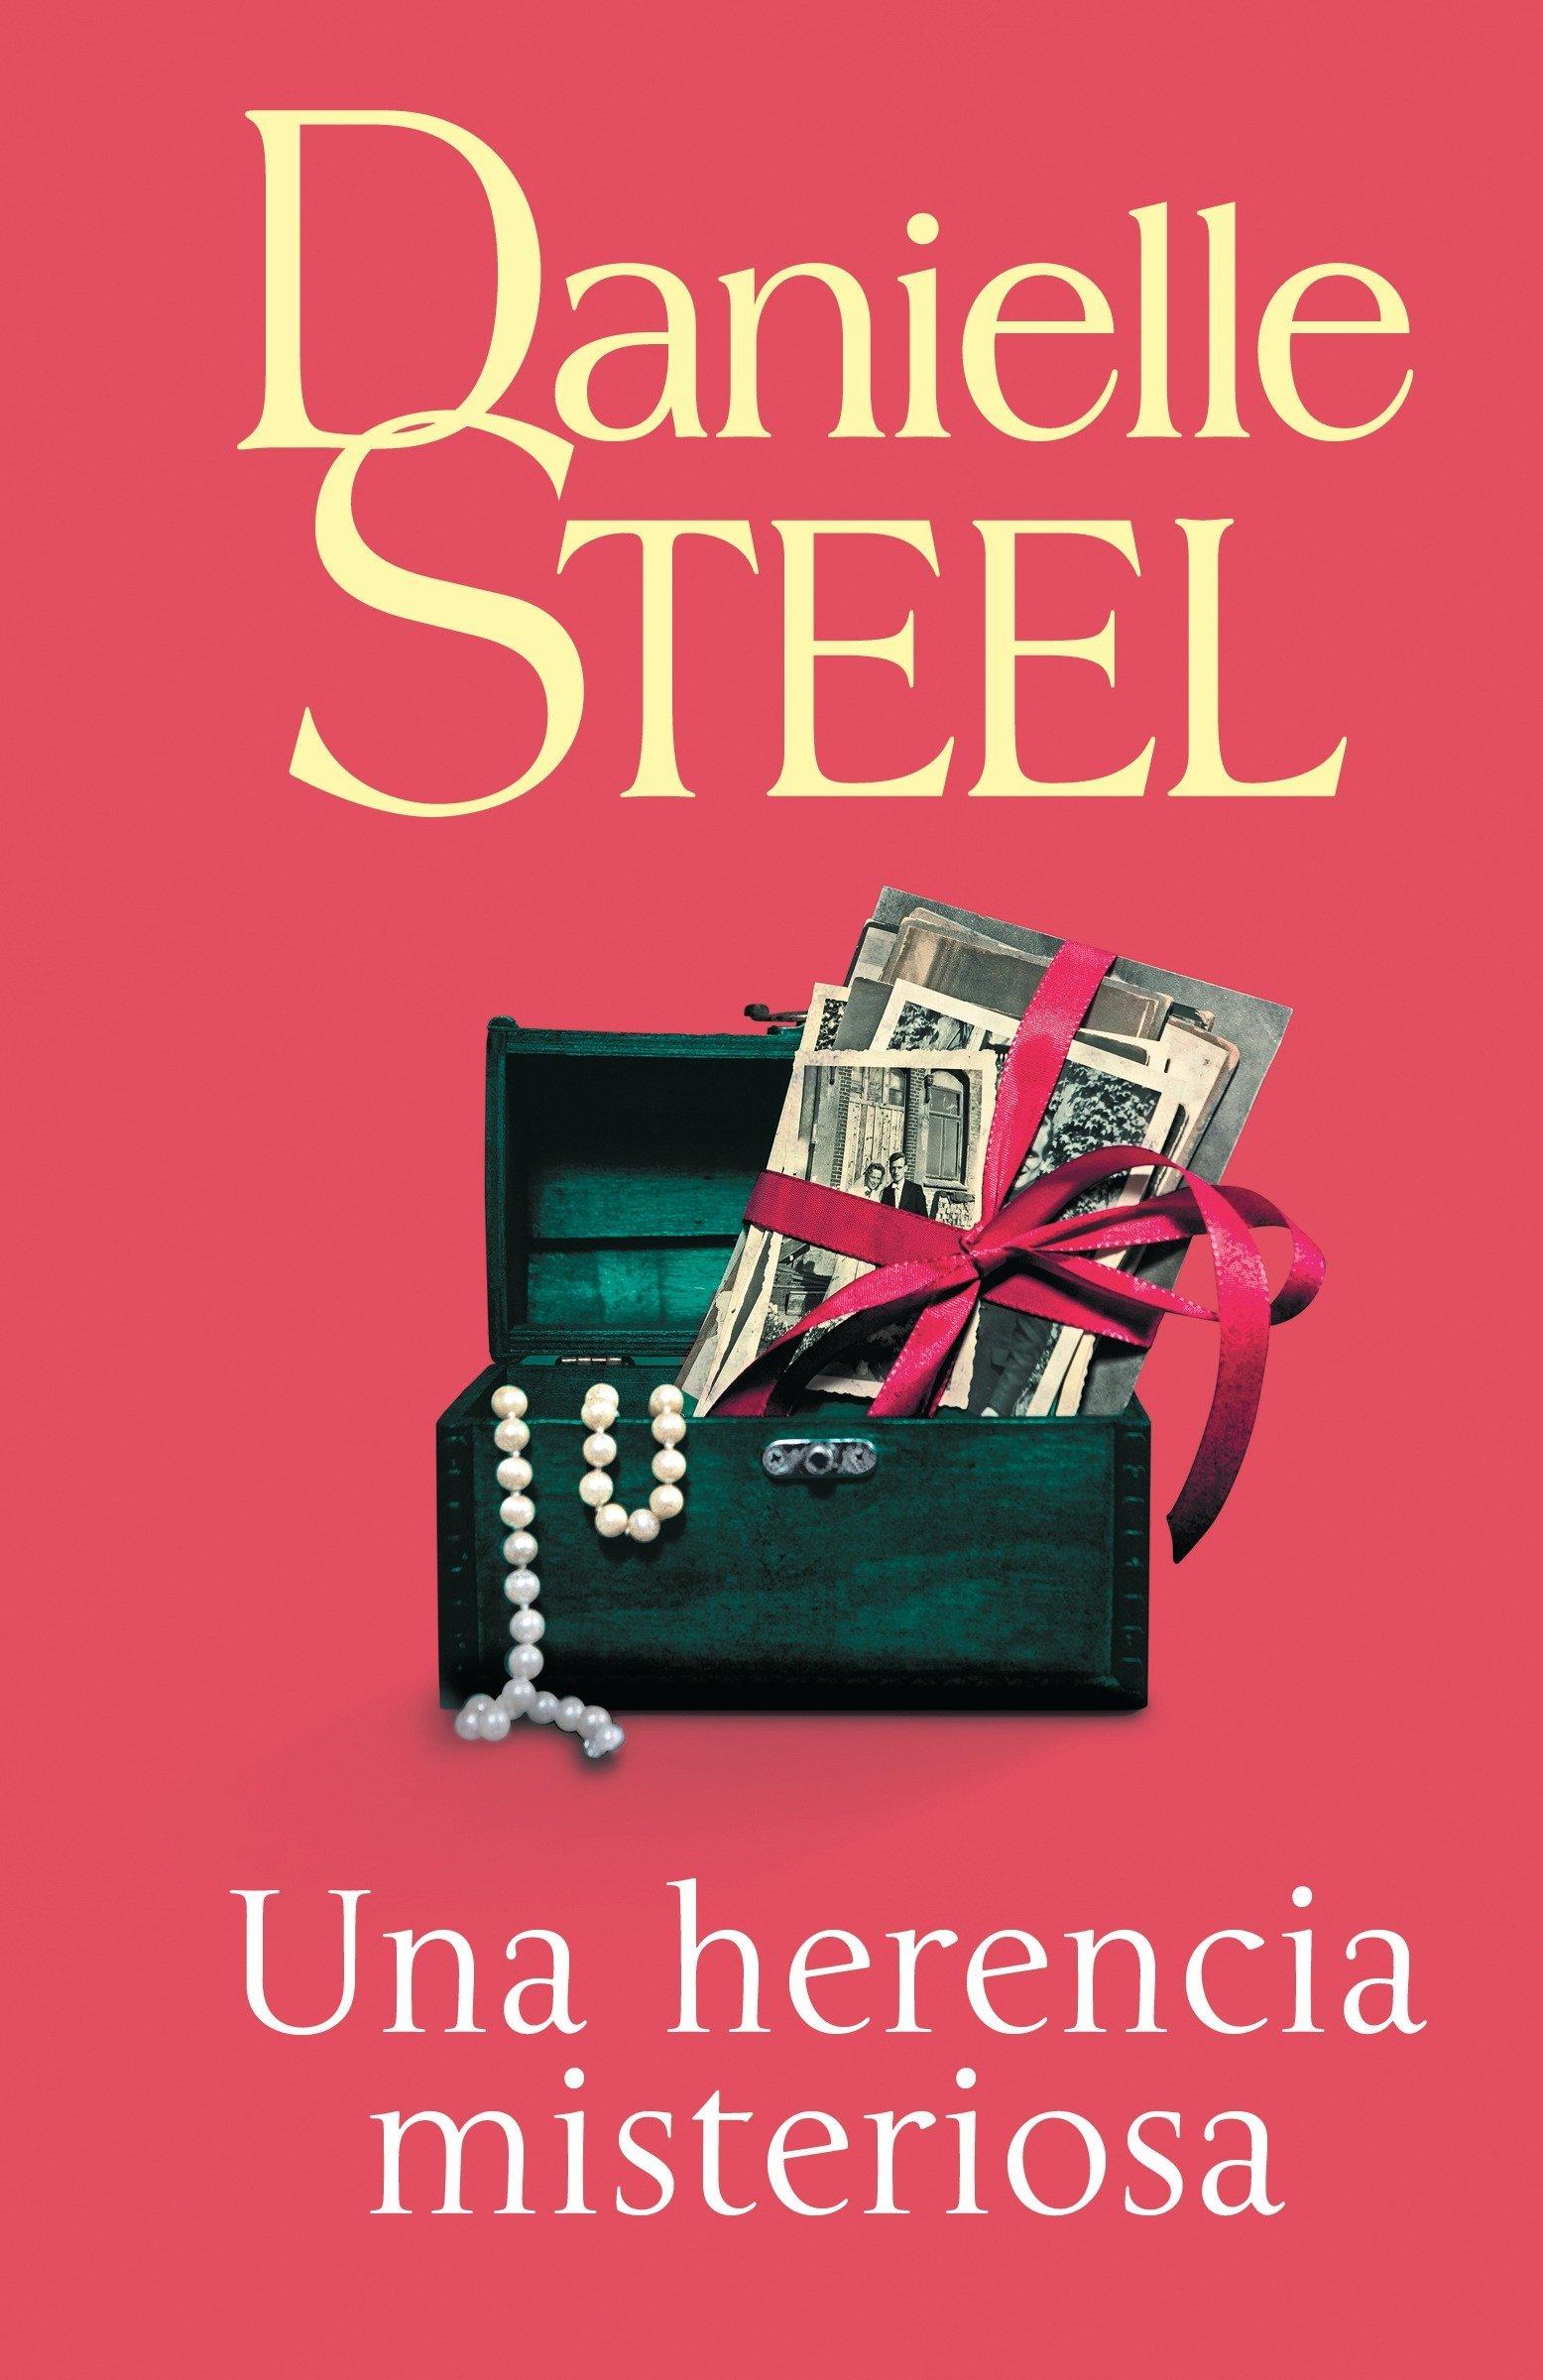 Una herencia misteriosa: Spanish-language edition of Property of a Noblewoman (Spanish Edition): Danielle Steel: 9780525435860: Amazon.com: Books